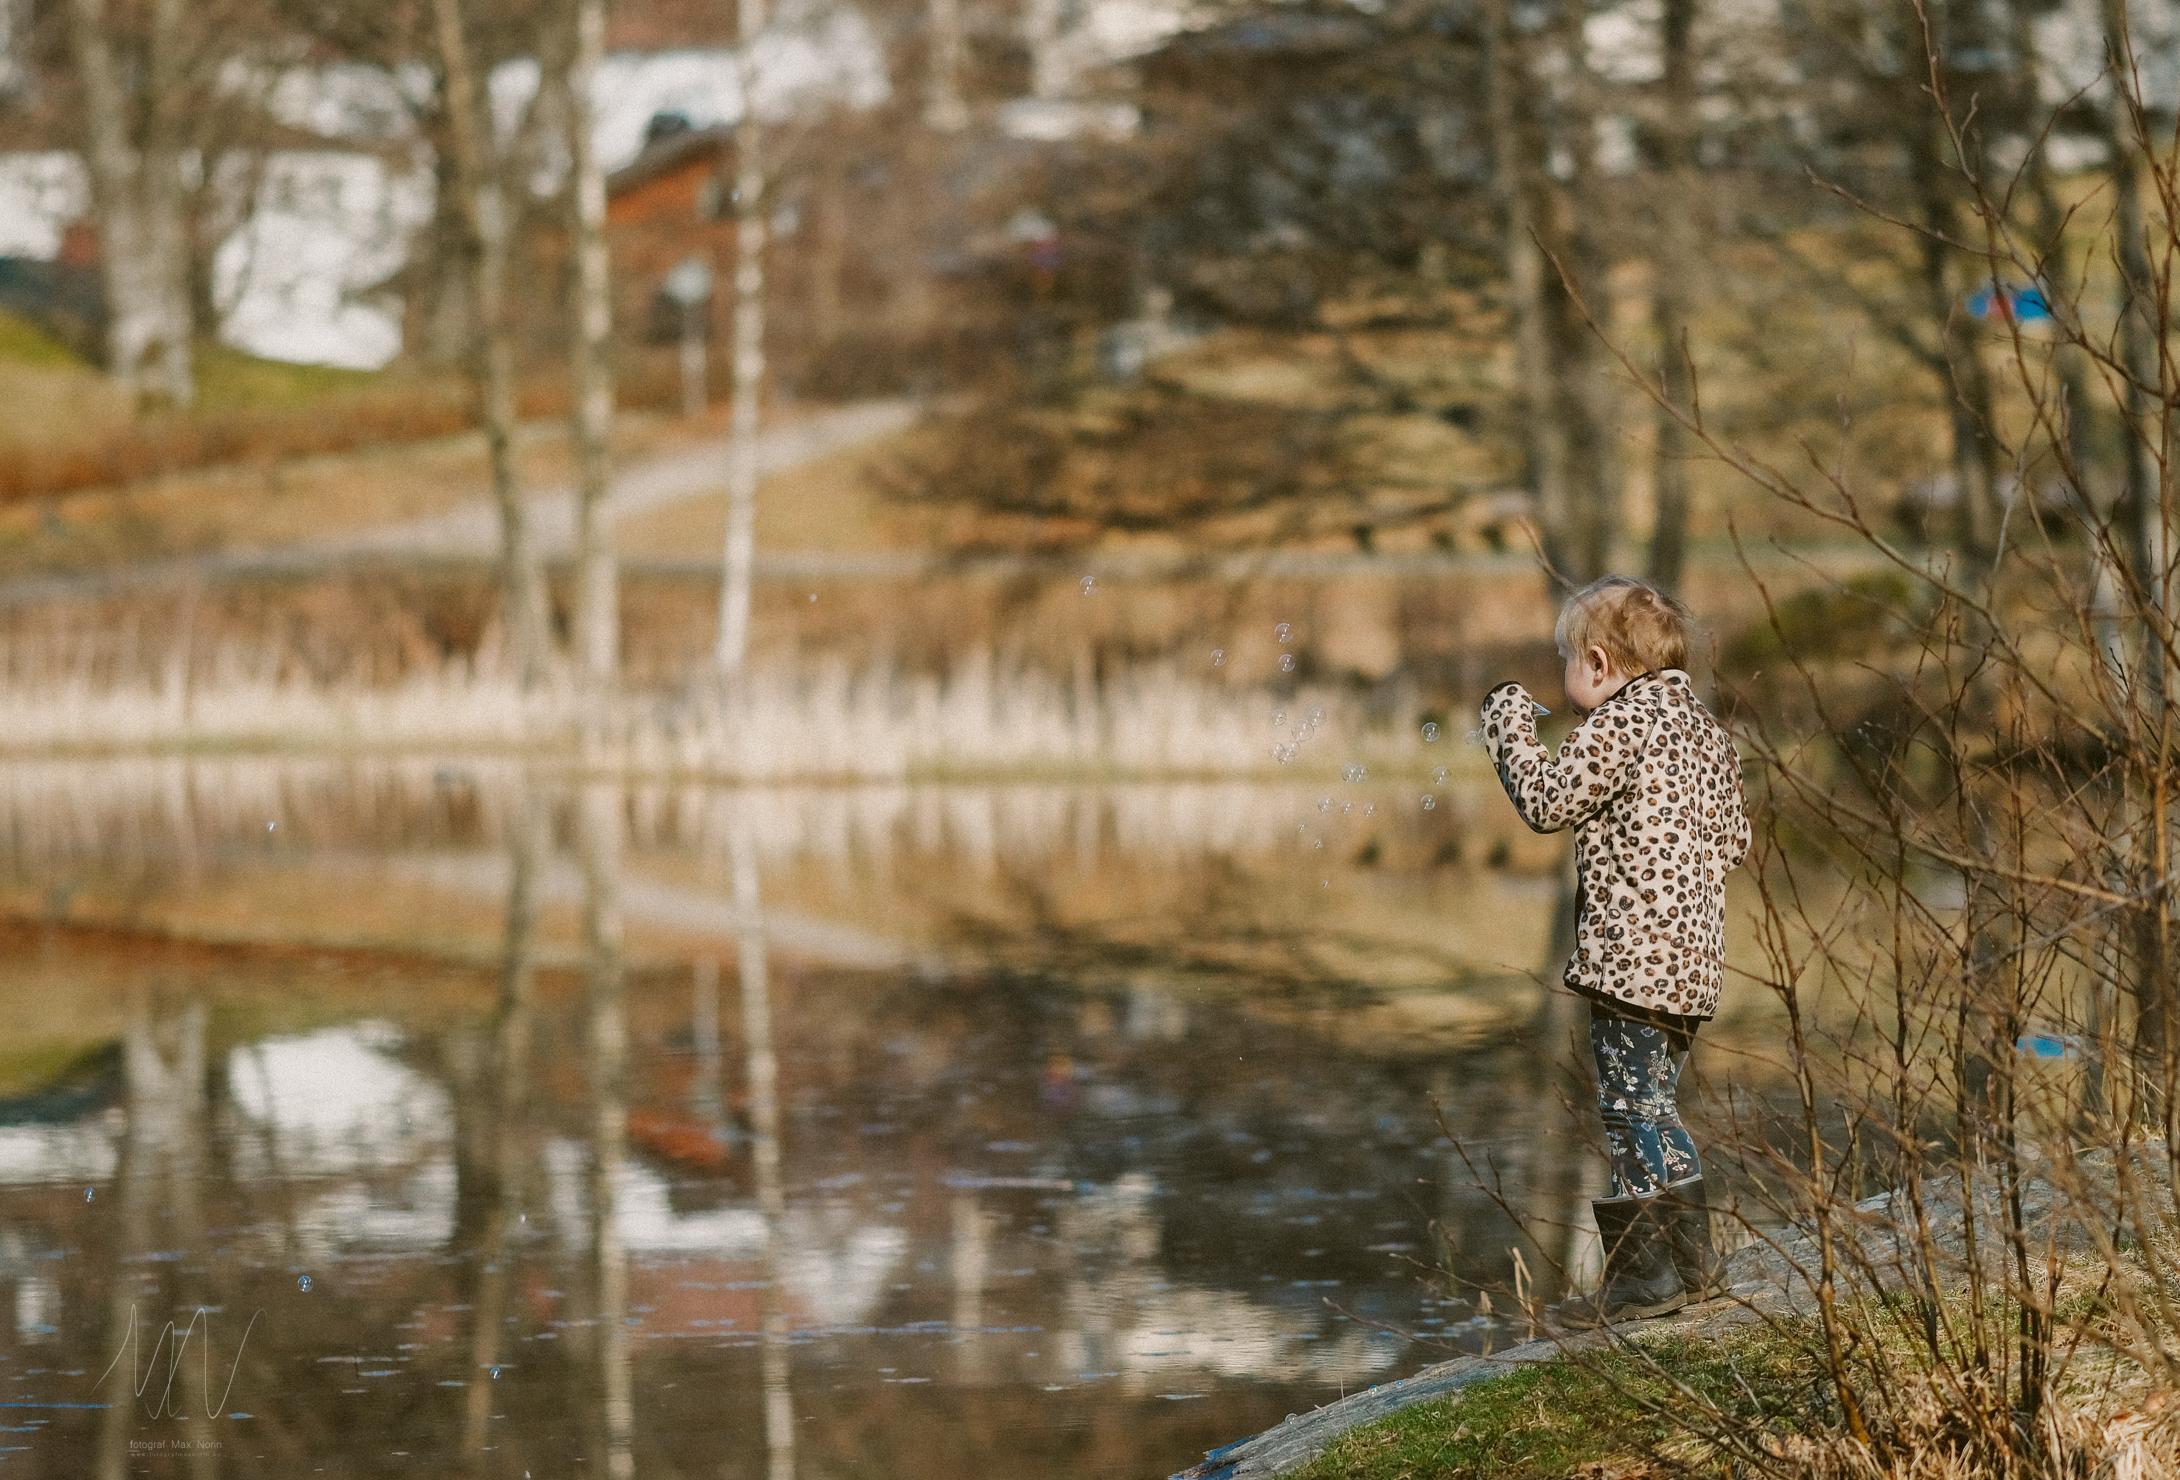 barnfoto-Fotograf-Max-Norin-Borås-1.jpg